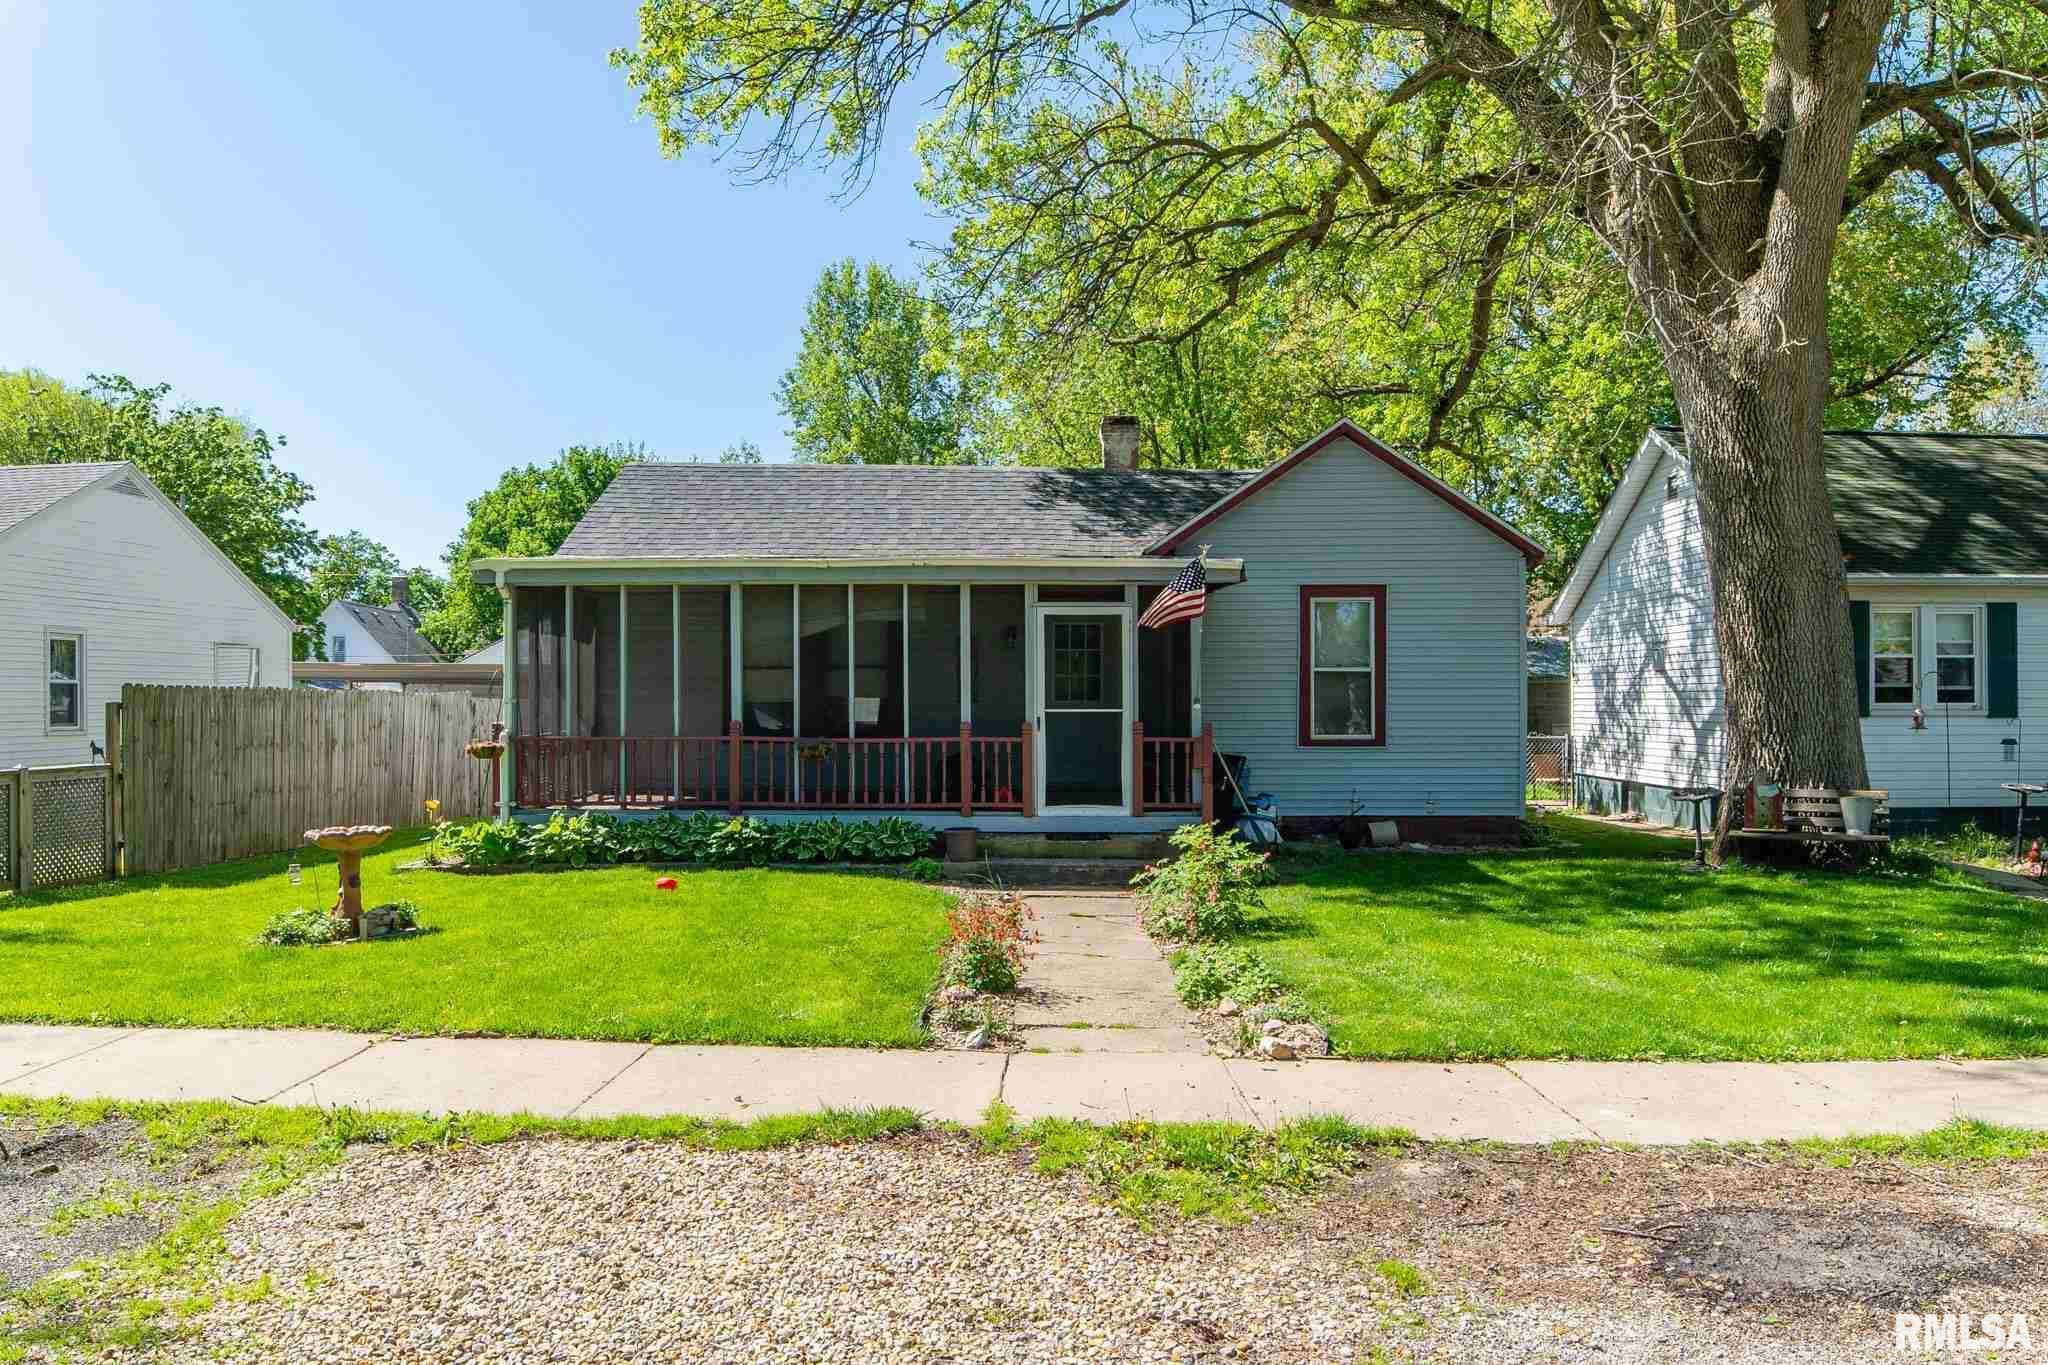 313 W MULBERRY Property Photo - San Jose, IL real estate listing